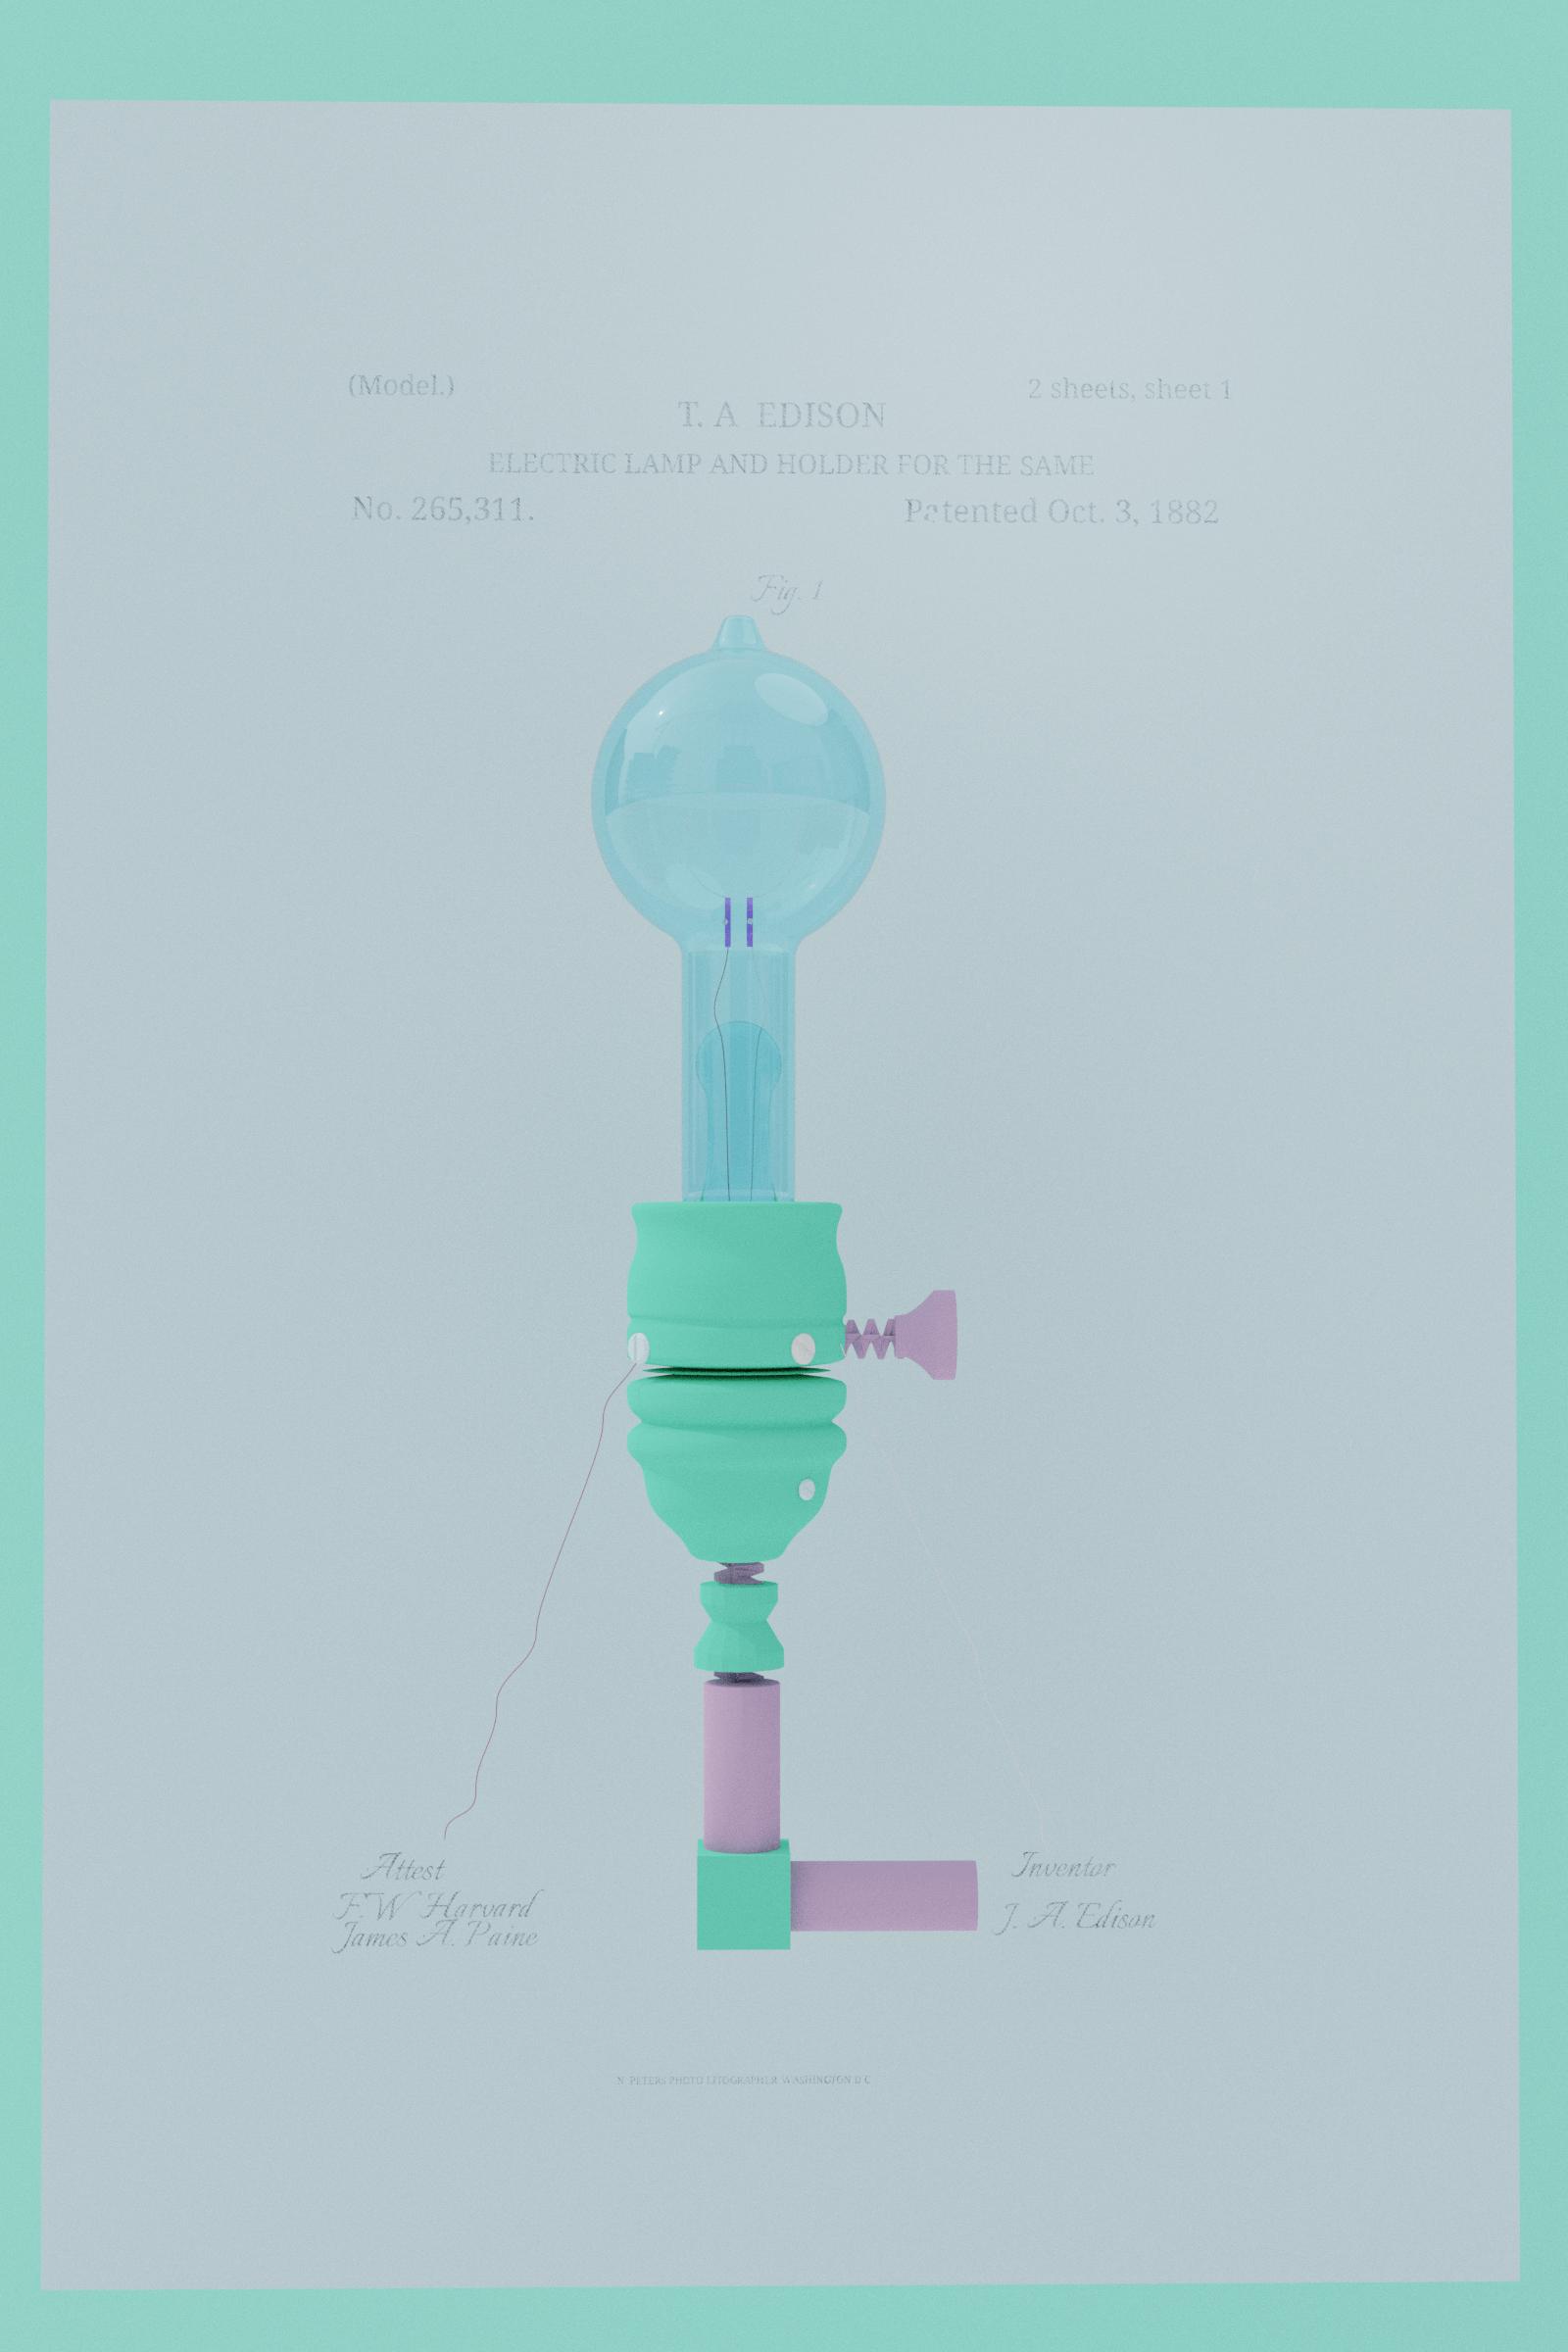 Lightbulb 3D Animation